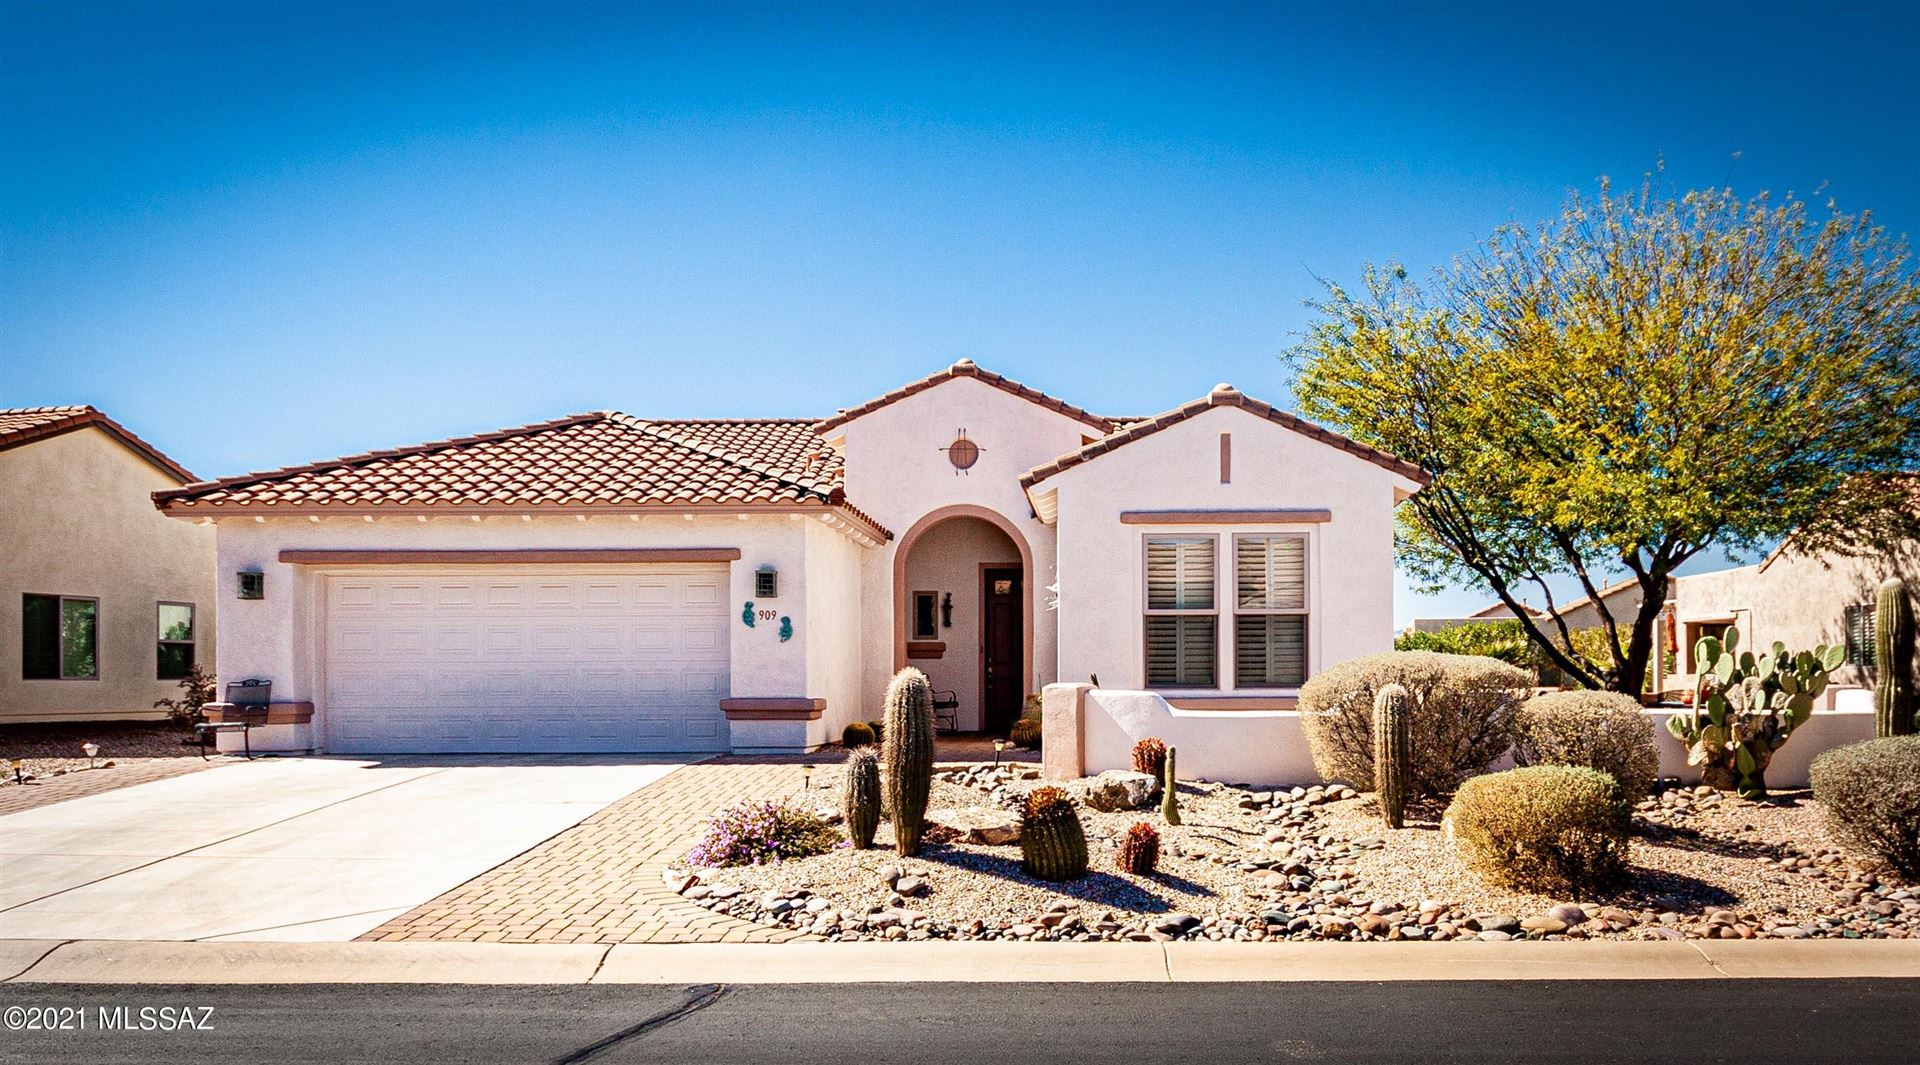 909 N Turquoise Vista Drive, Green Valley, AZ 85614 - MLS#: 22104005